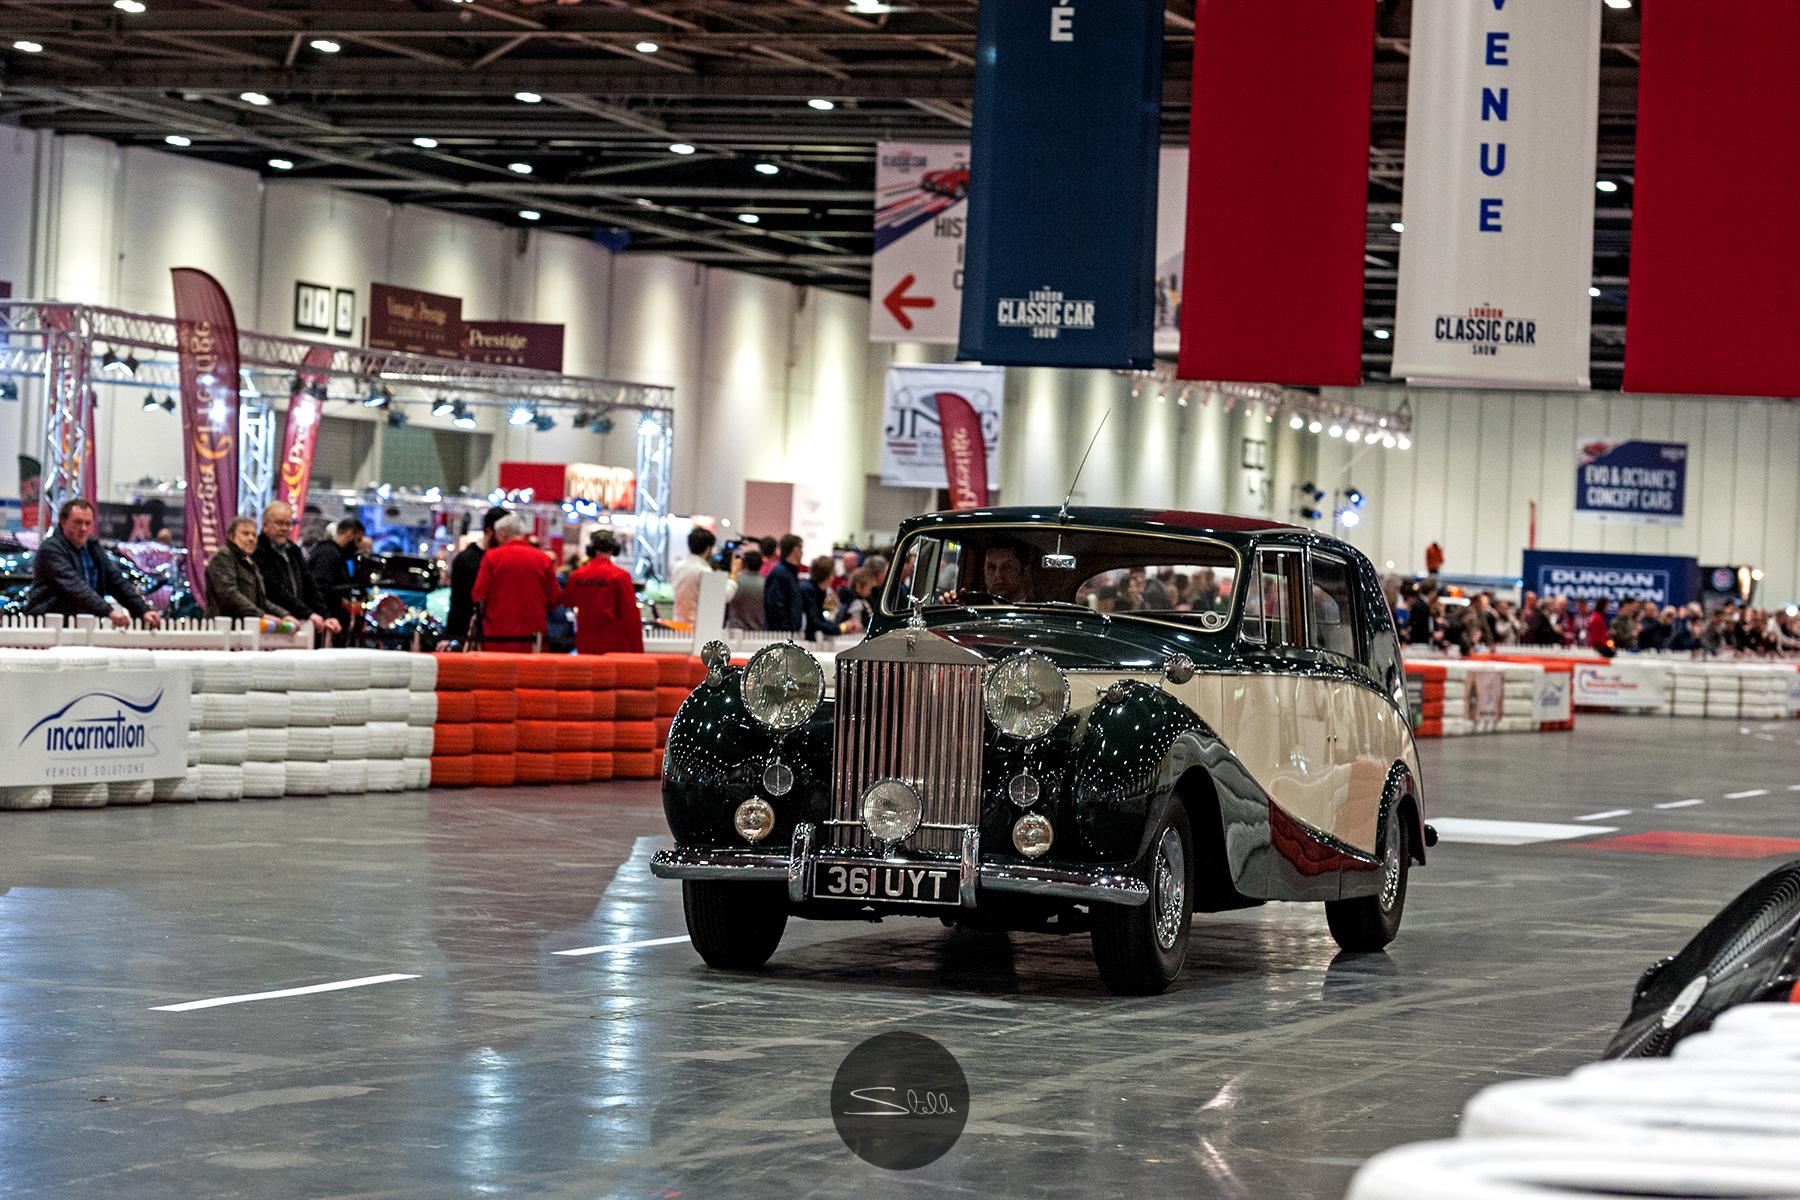 Stella Scordellis London Classic Car Show 2017 27 Watermarked.jpg